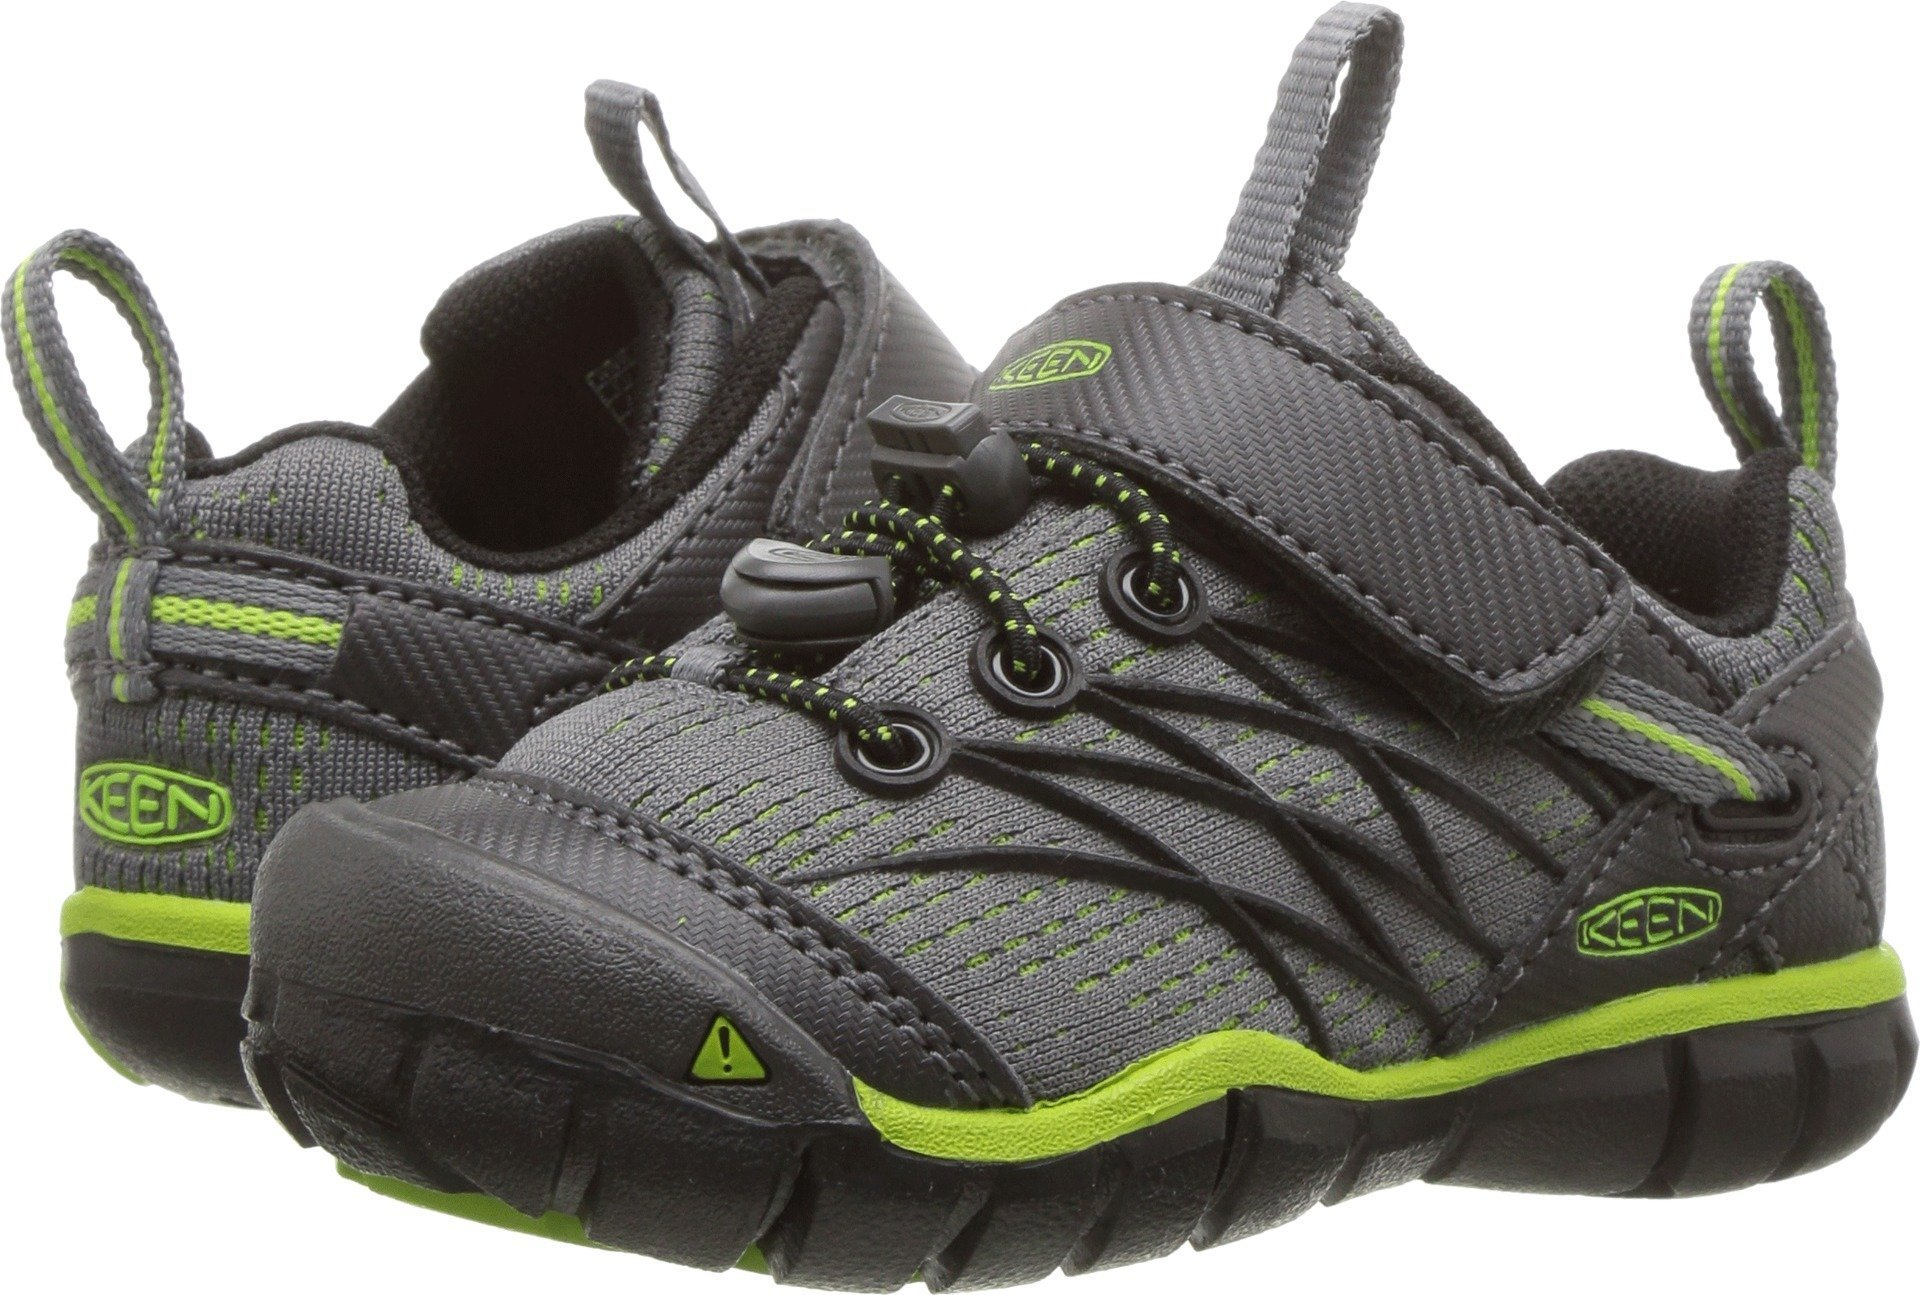 KEEN Unisex-Kids Chandler CNX Hiking Shoe, Magnet/Greenery, 12 M US Little Kid